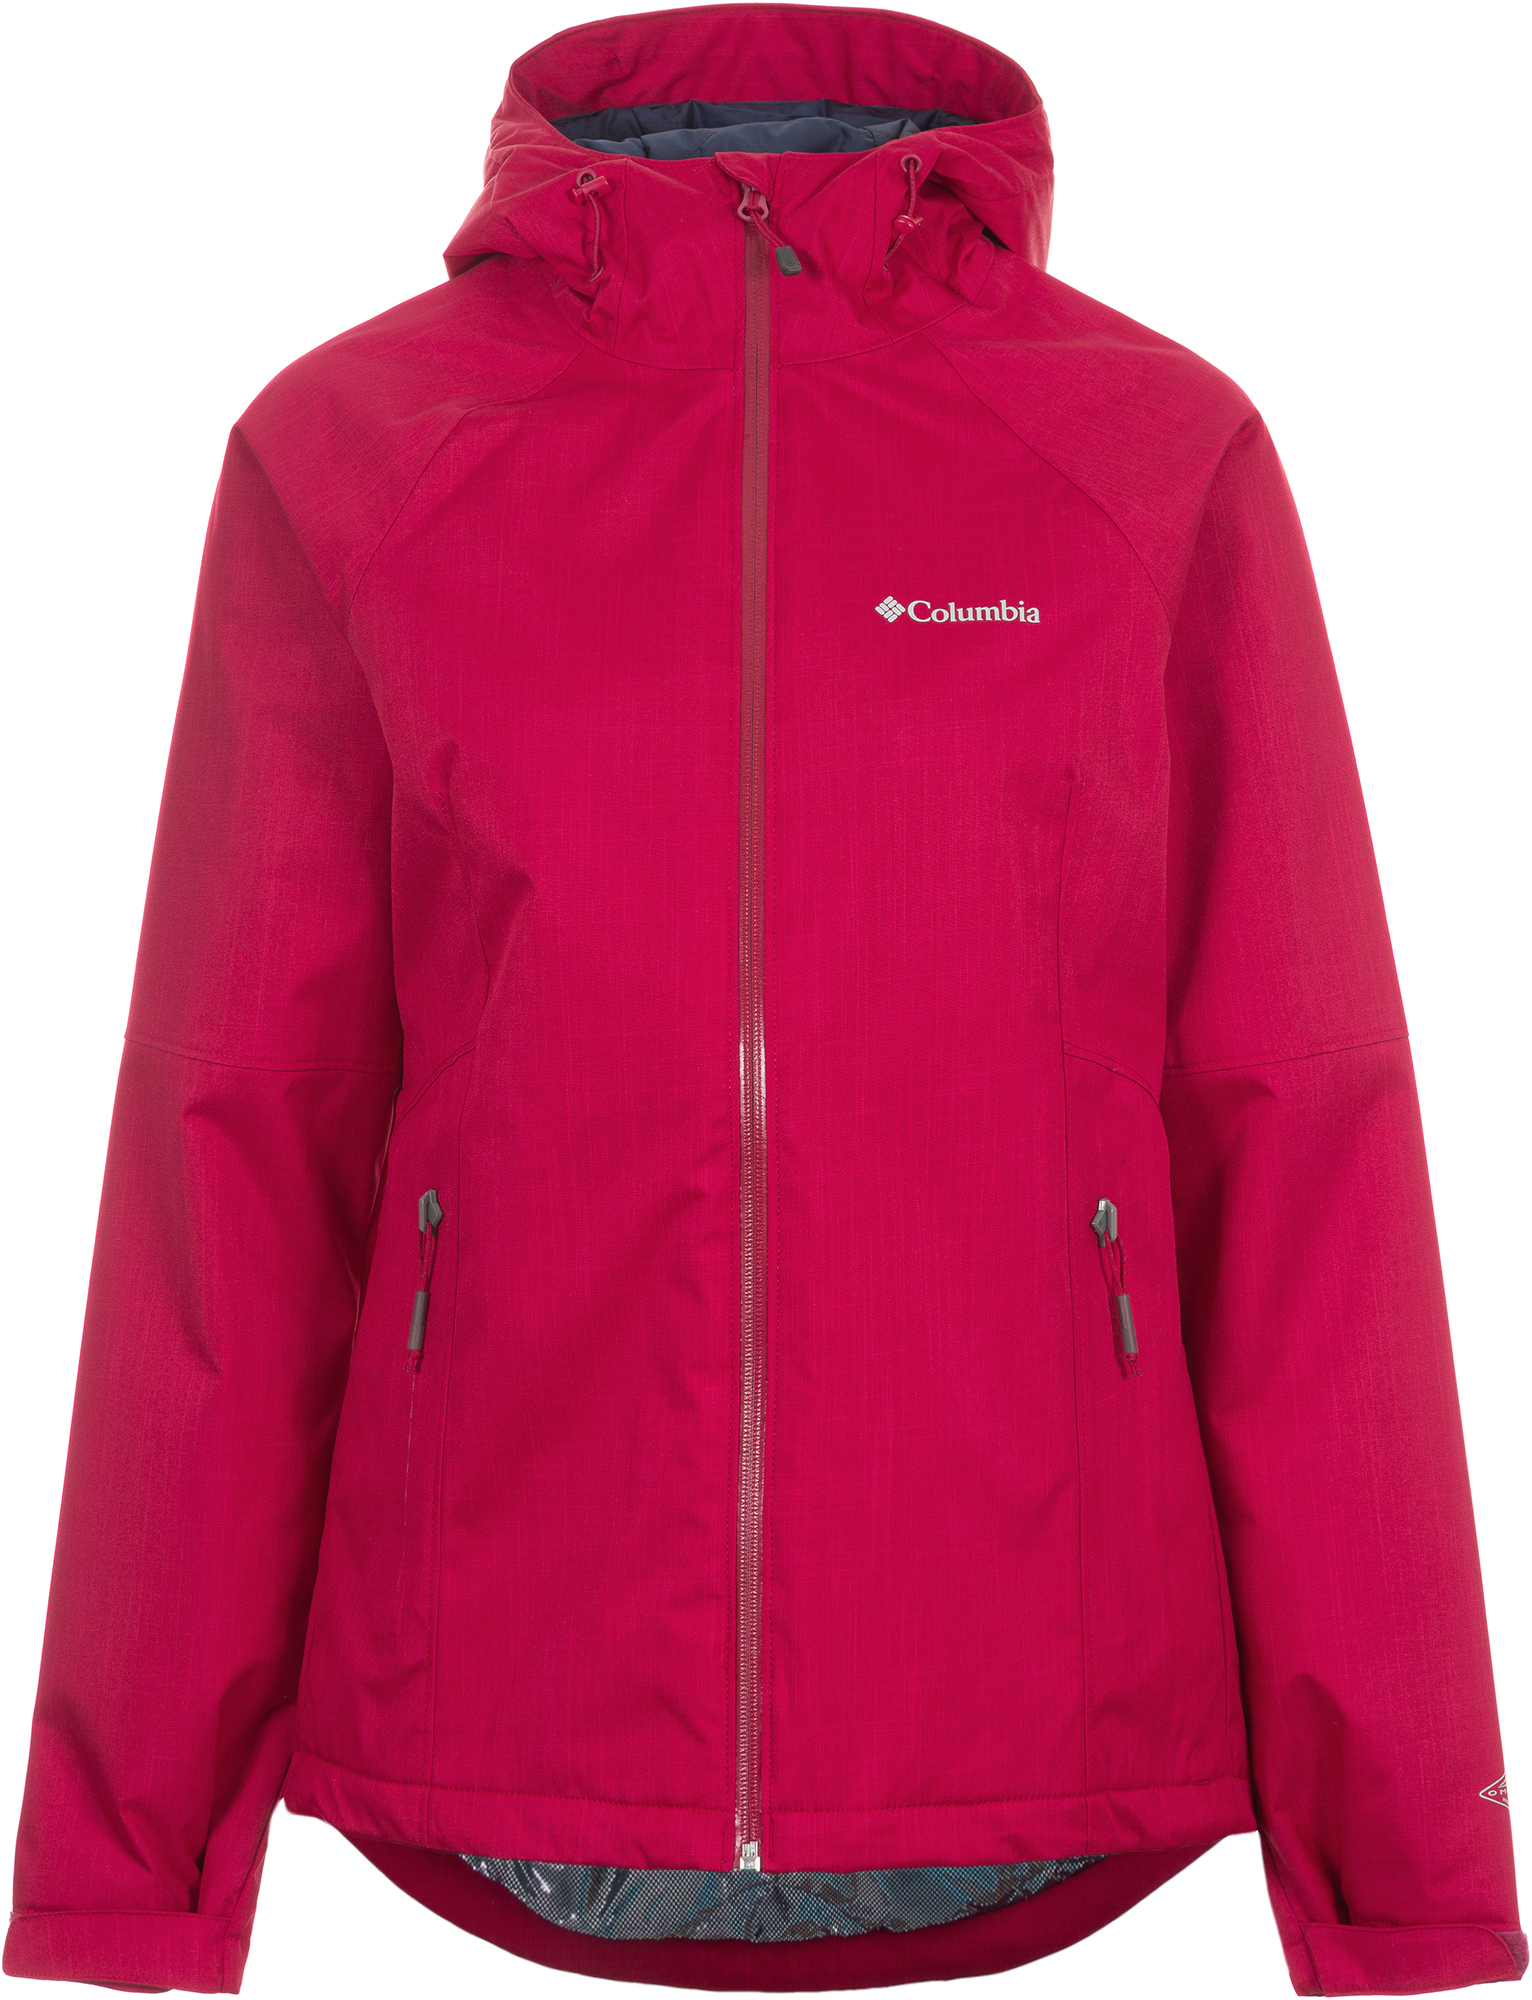 все цены на Columbia Куртка утепленная женская Columbia Sprague Mountain, размер 50